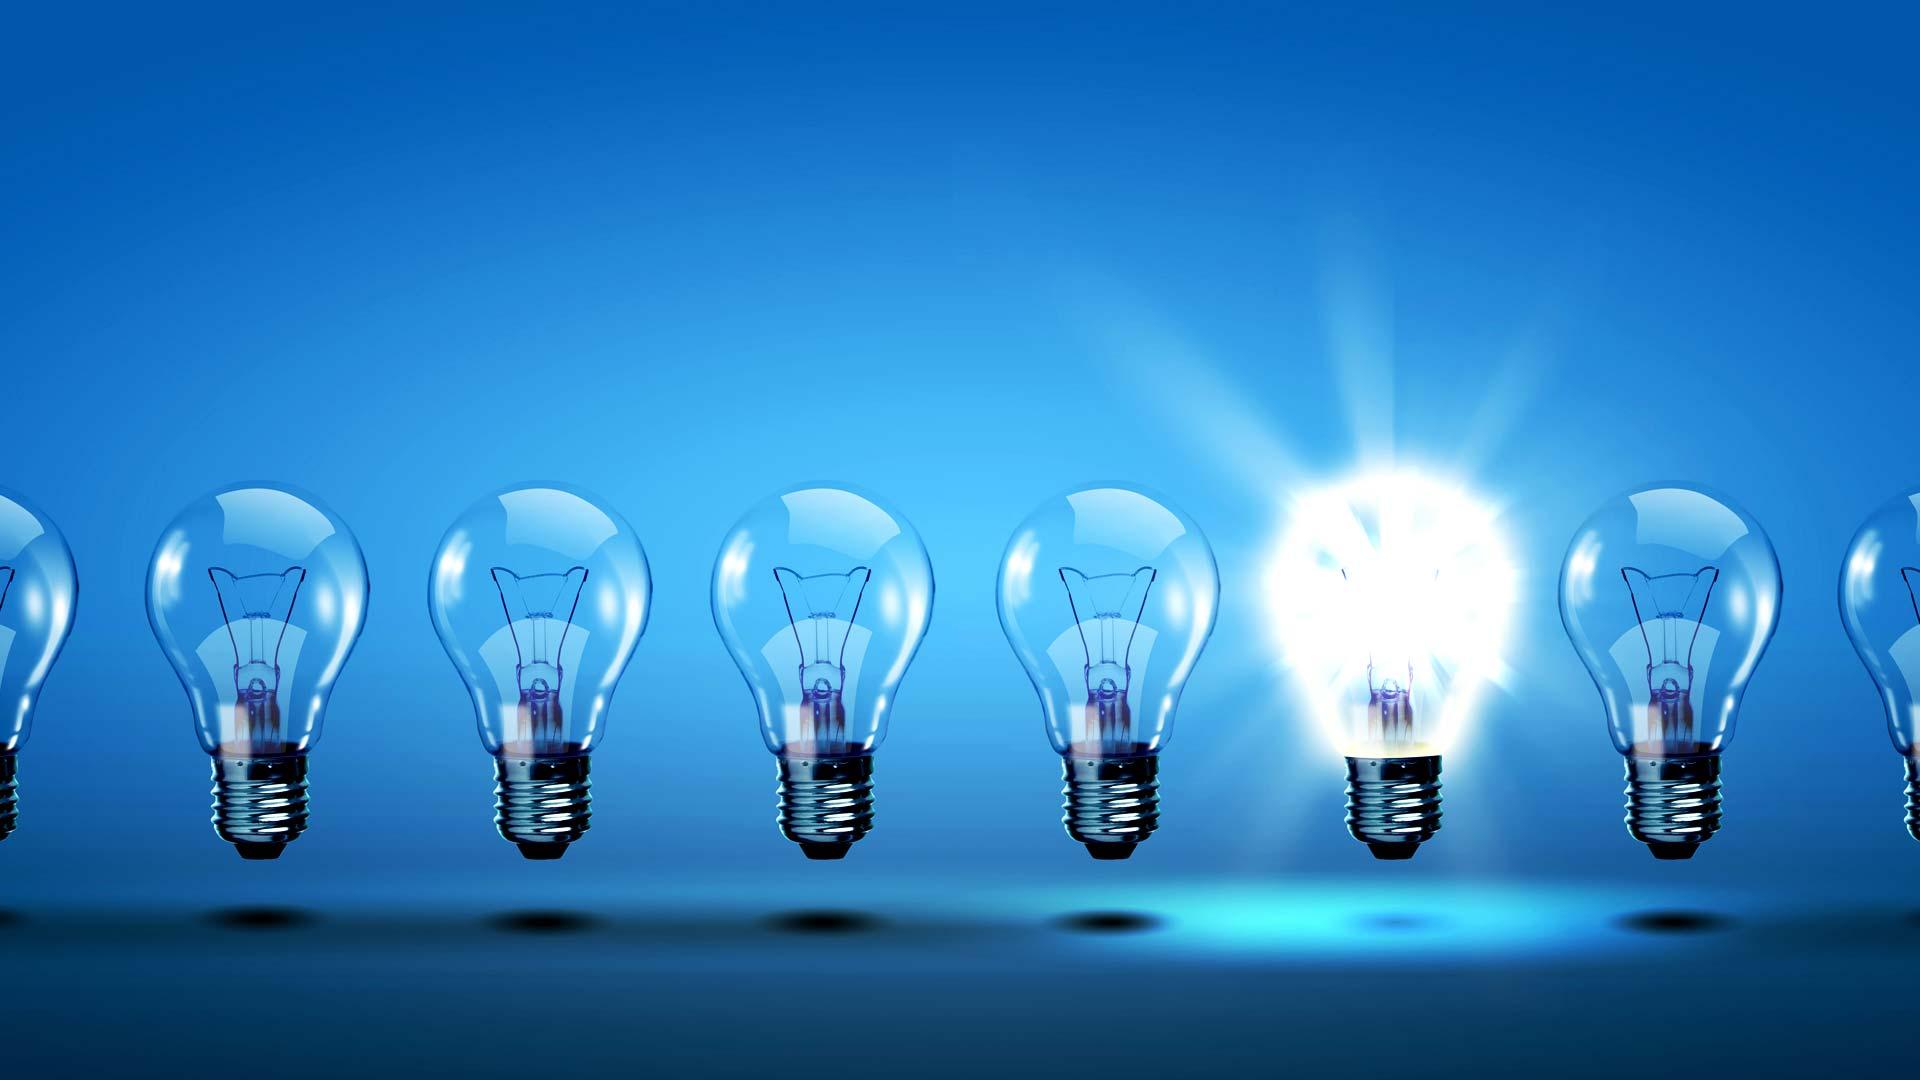 webhomes-thinking-plus-innovation-innovation-plus-emerging-thought.jpg